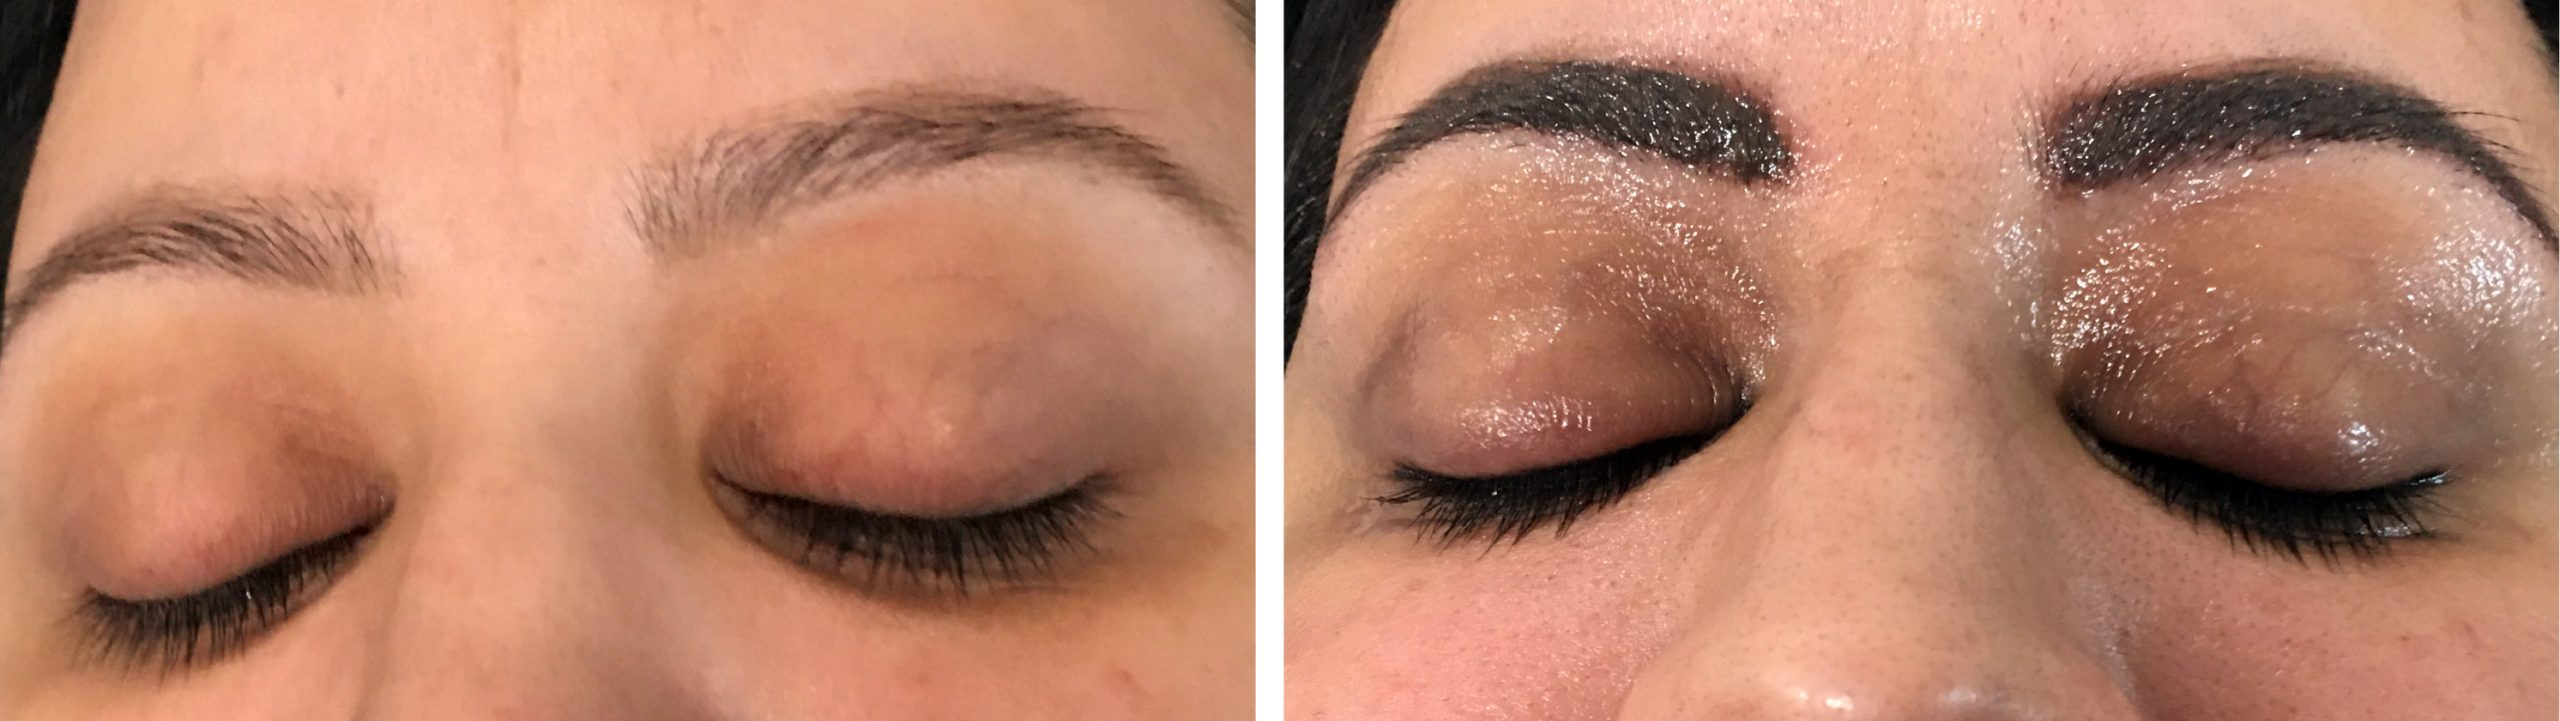 Permanent Eyebrows - ABG Wellness - Chandler AZ